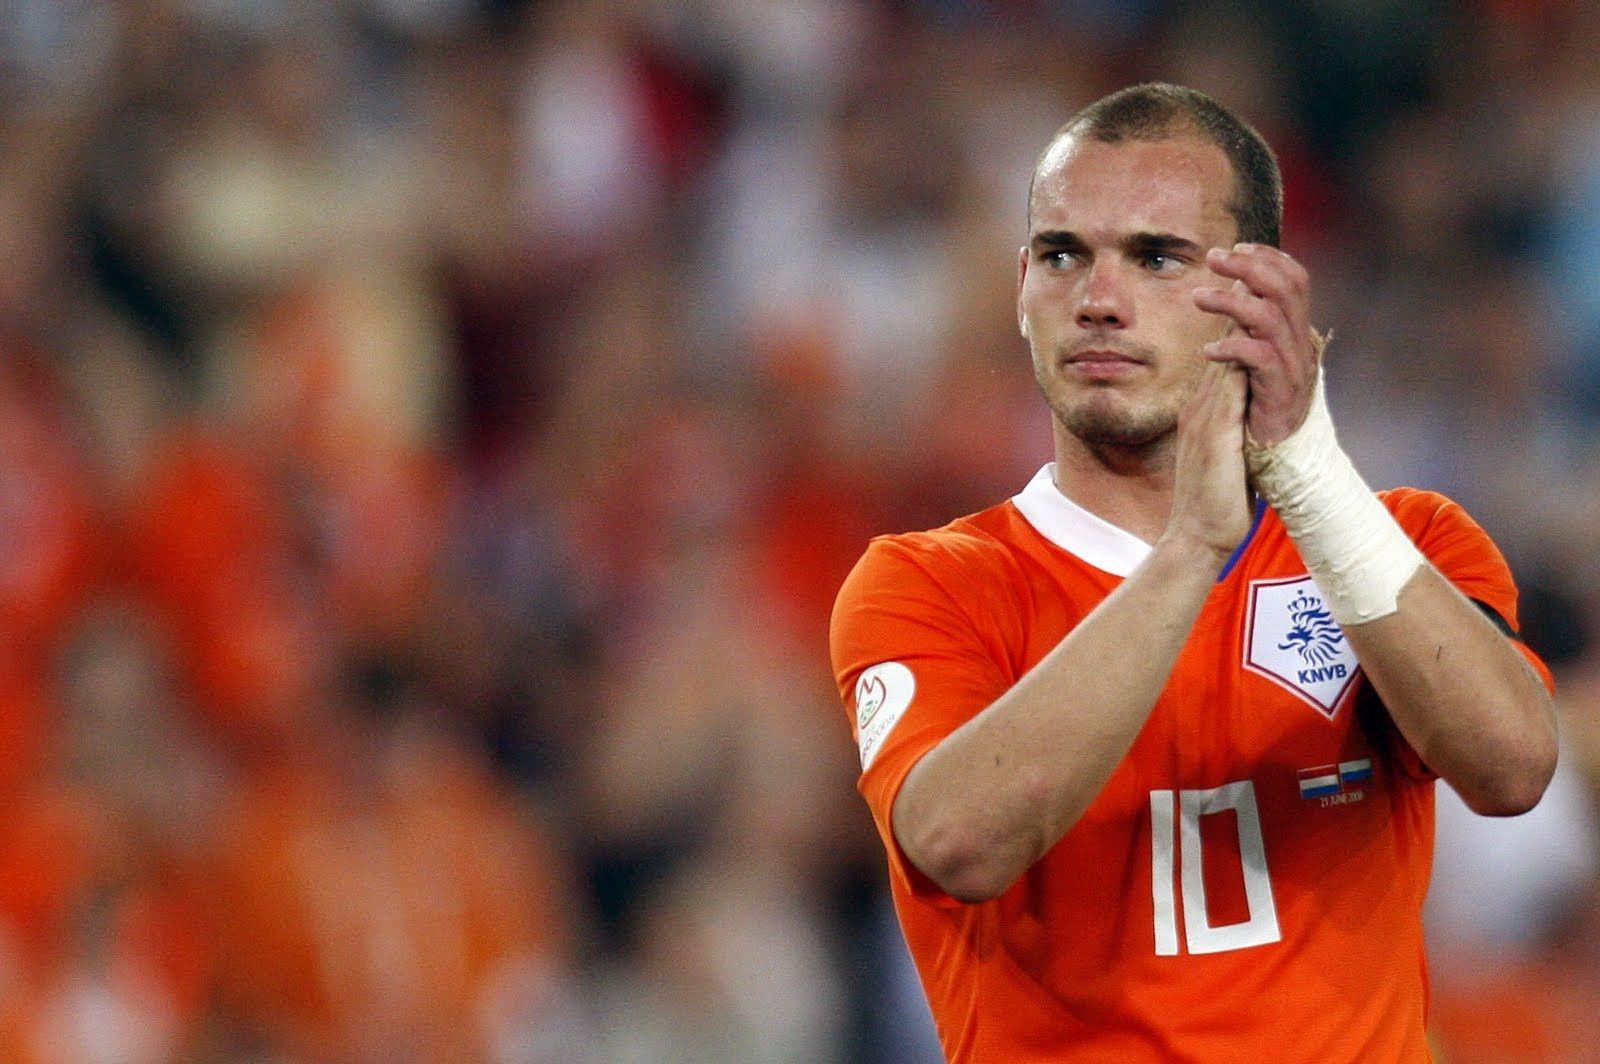 #arjen robben #wesley sneijder | Tumblr | Mexico world cup